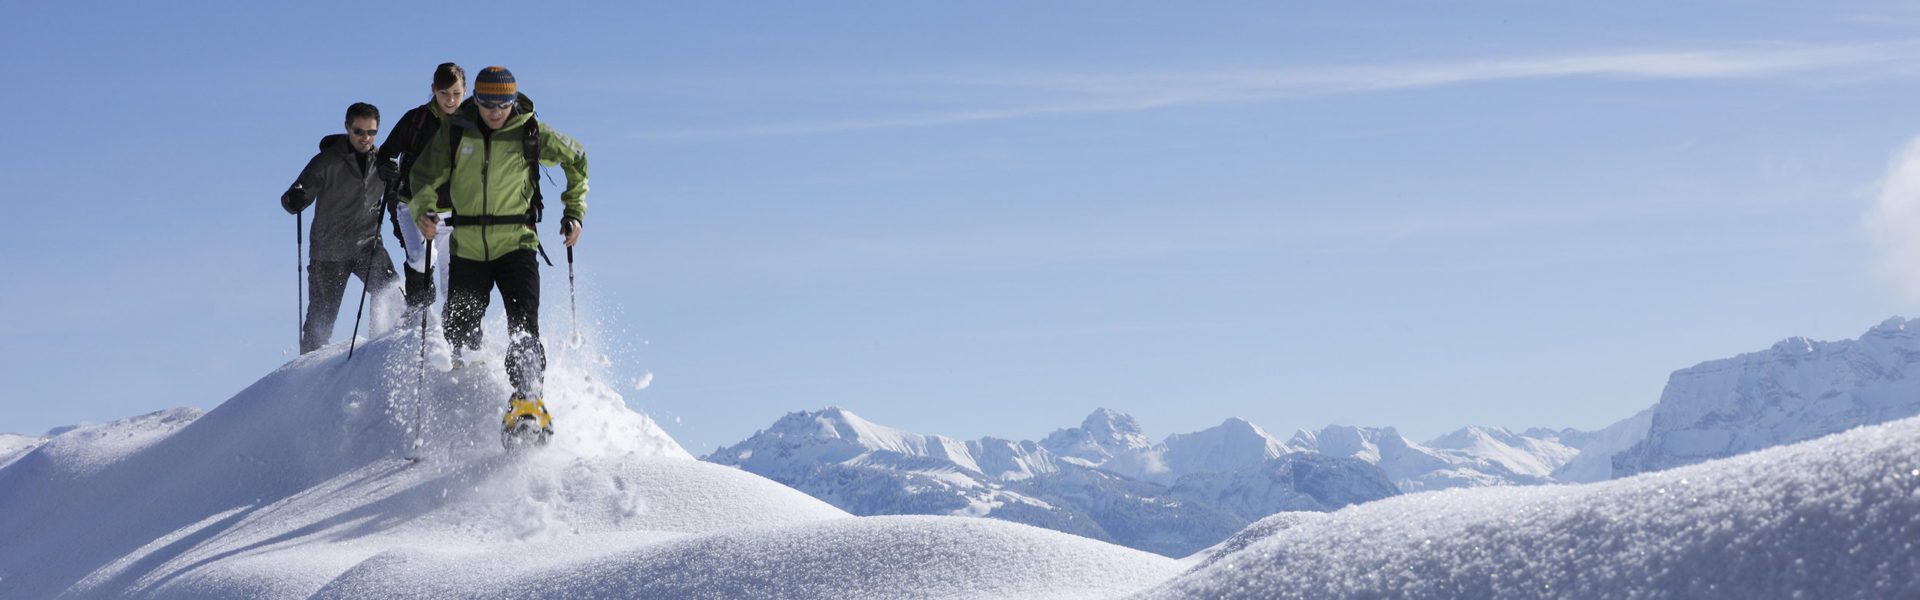 Schneeschuhwandern, Schneeschuhtour am Bödele © Adolf Bereuter / Bregenzerwald Tourismus